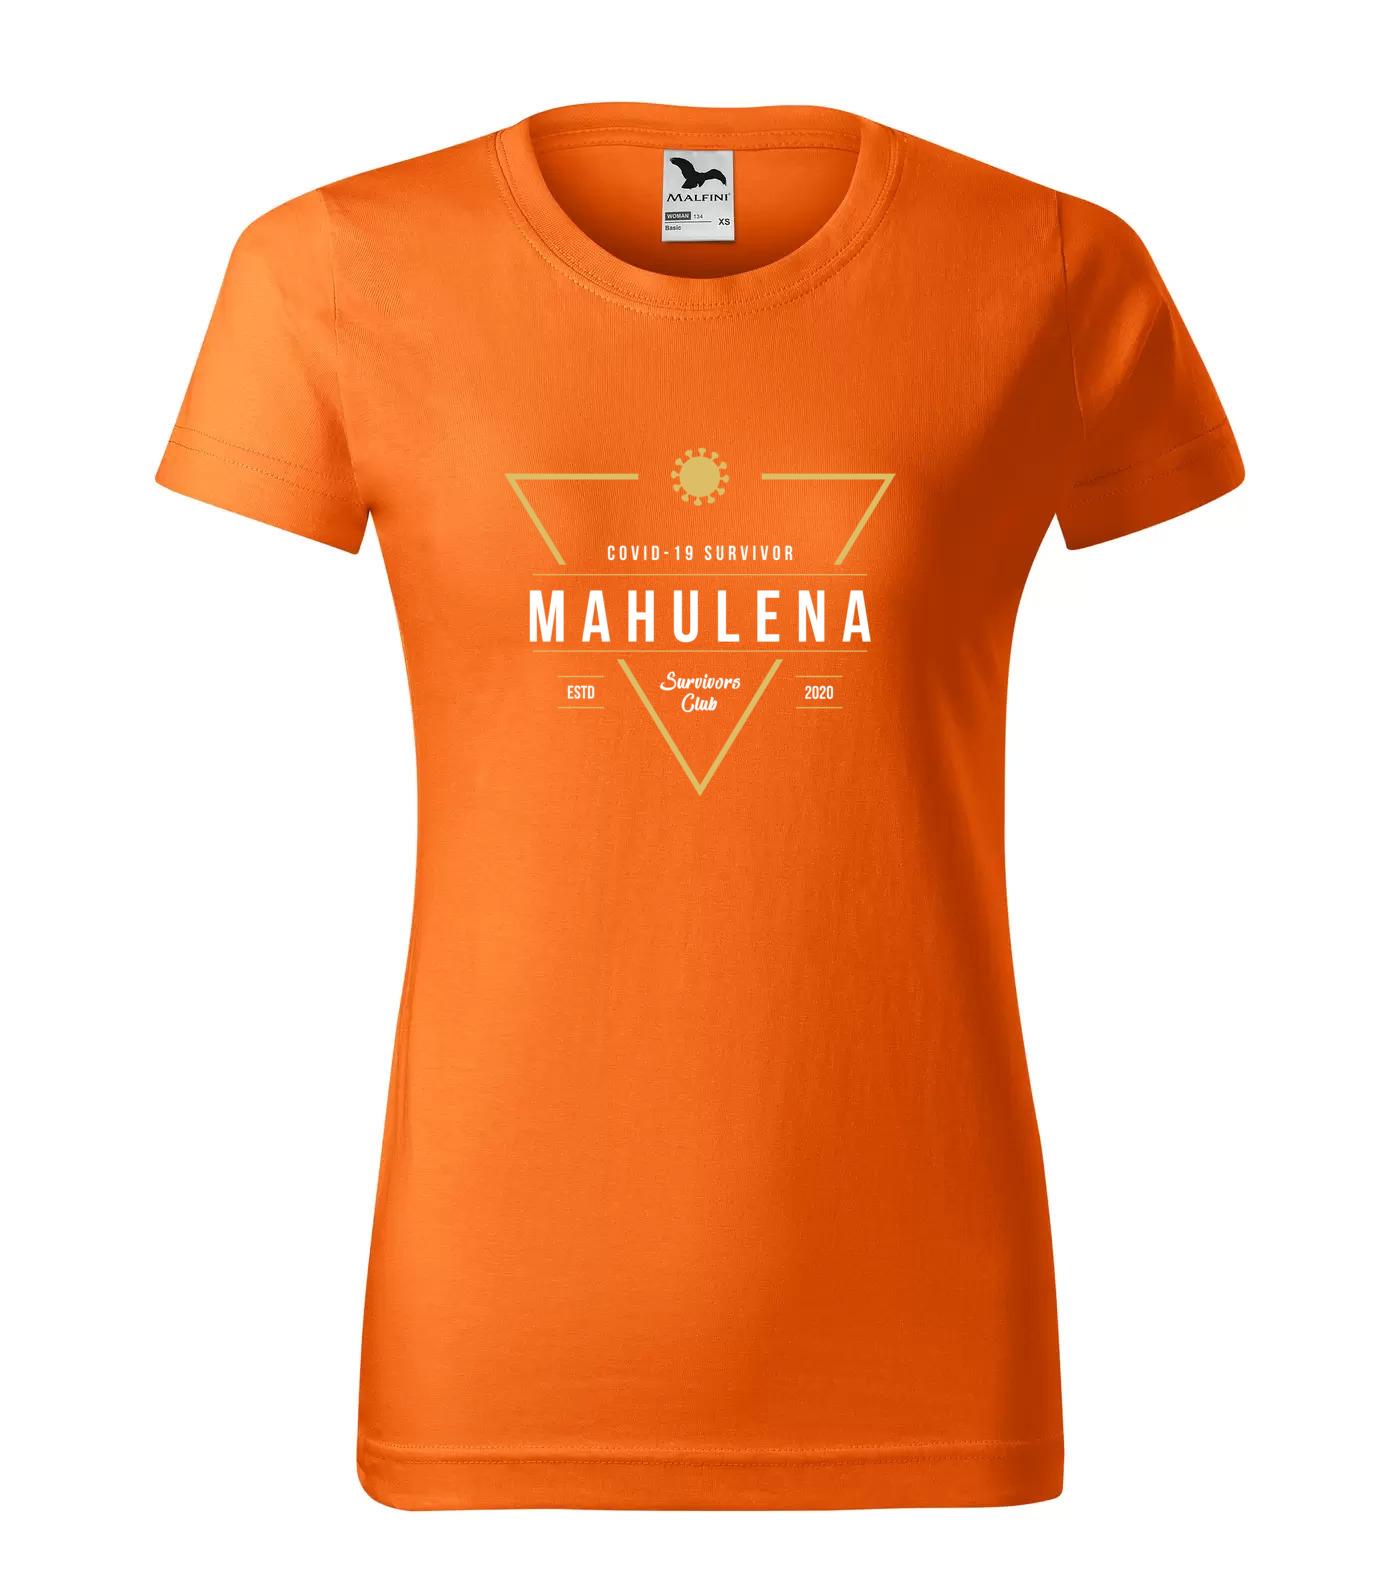 Tričko Survivor Club Mahulena